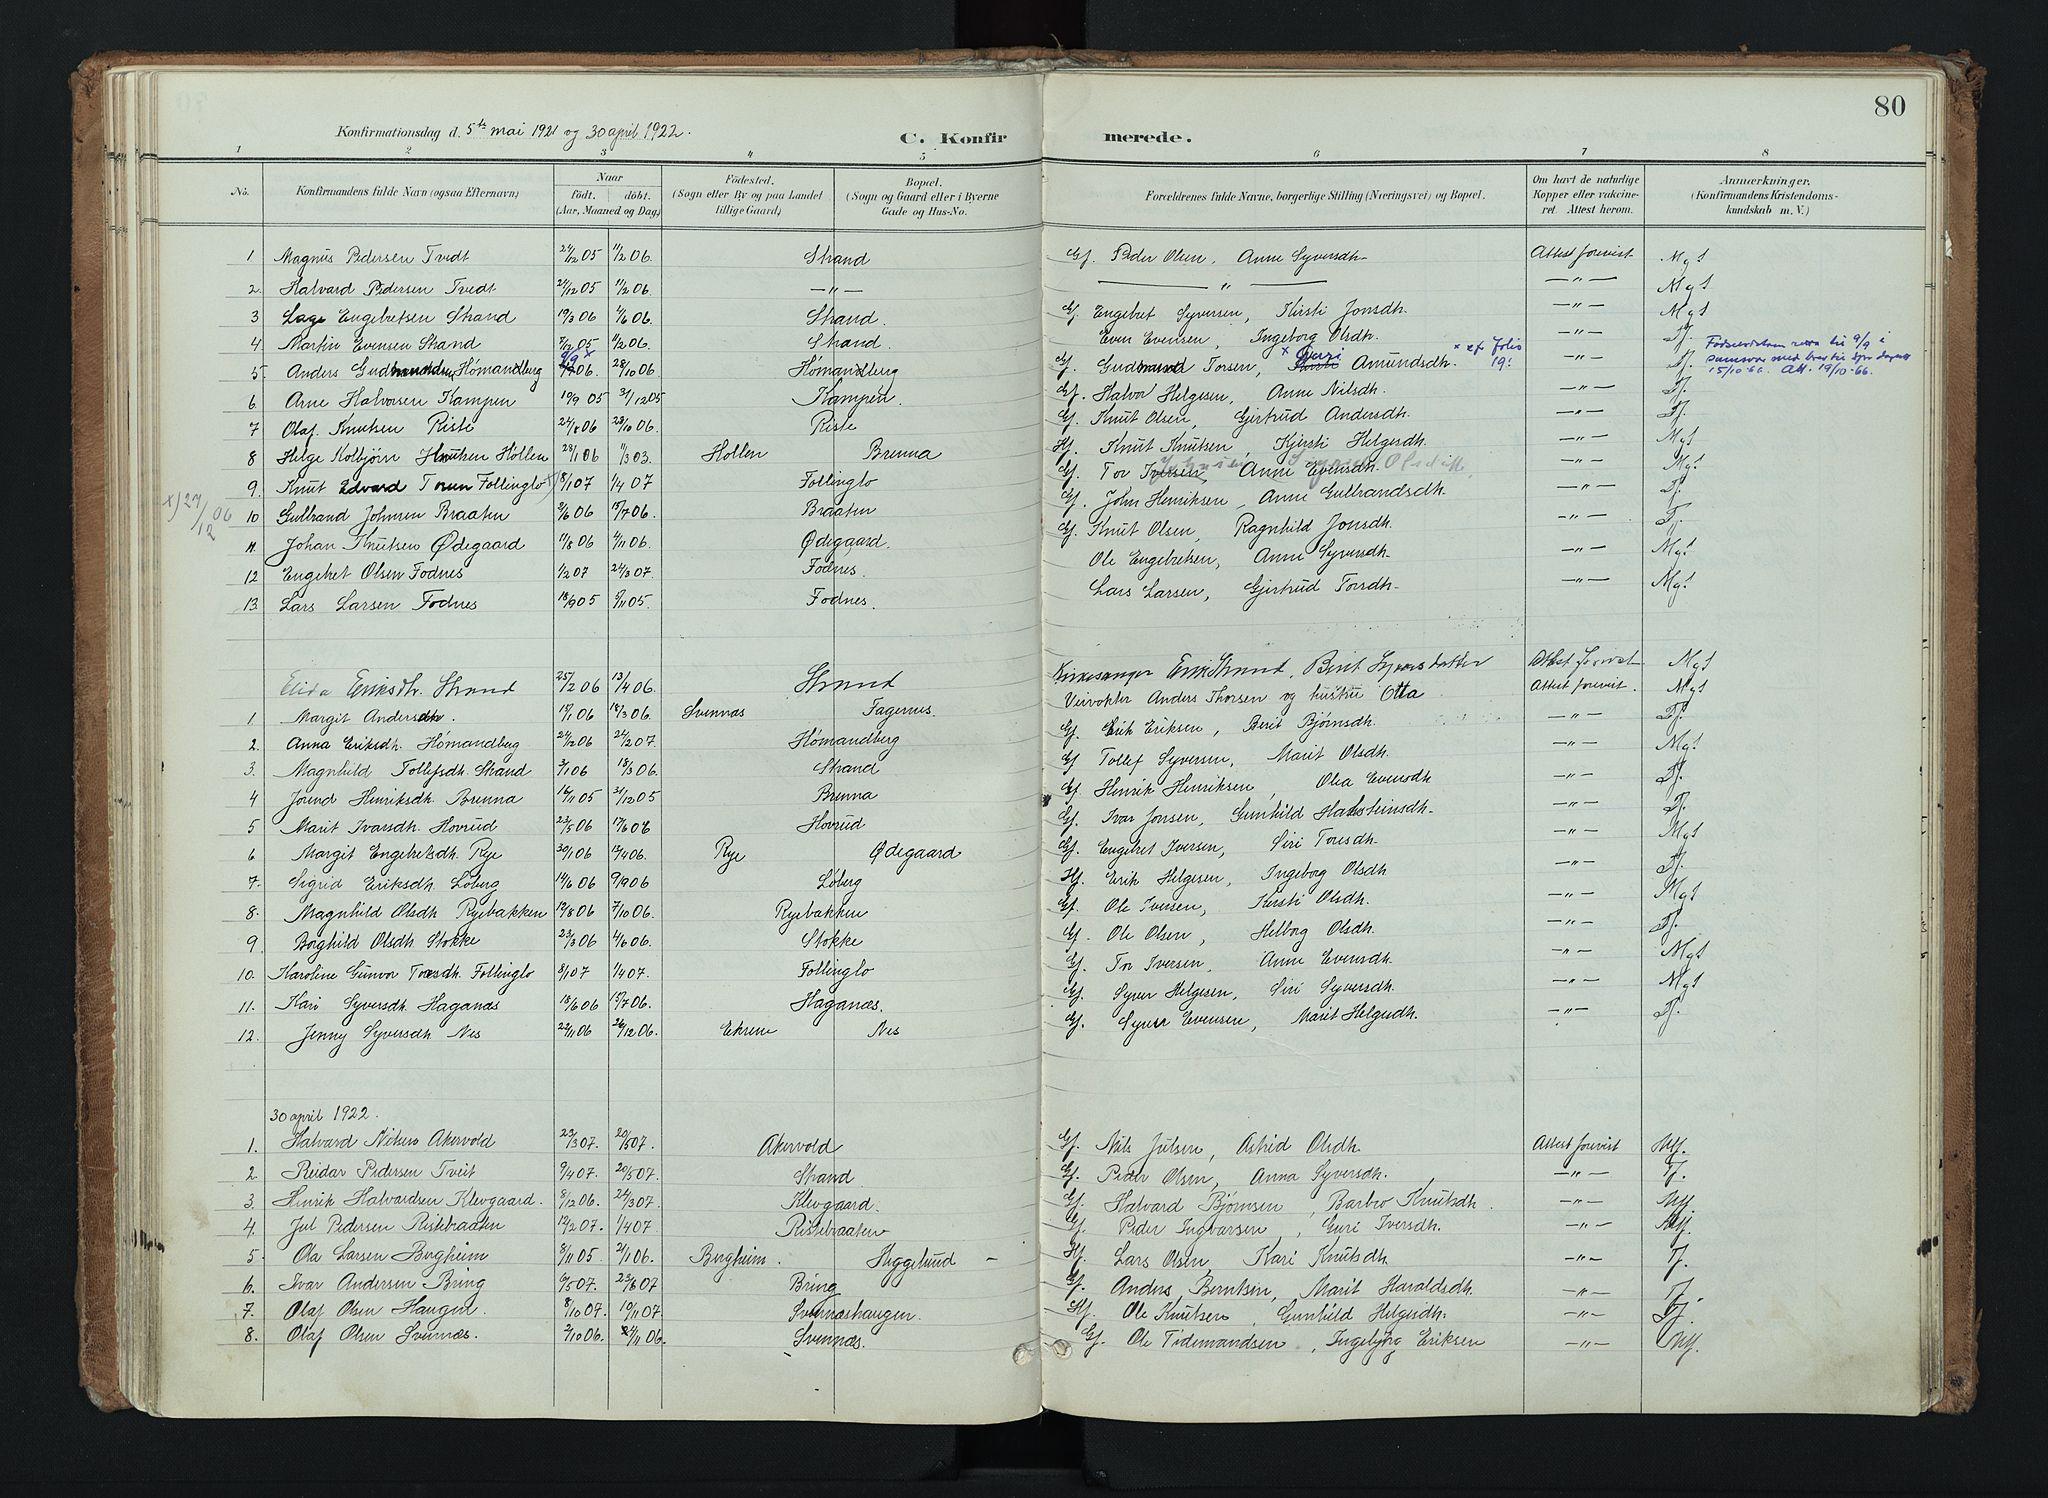 SAH, Nord-Aurdal prestekontor, Ministerialbok nr. 16, 1897-1925, s. 80